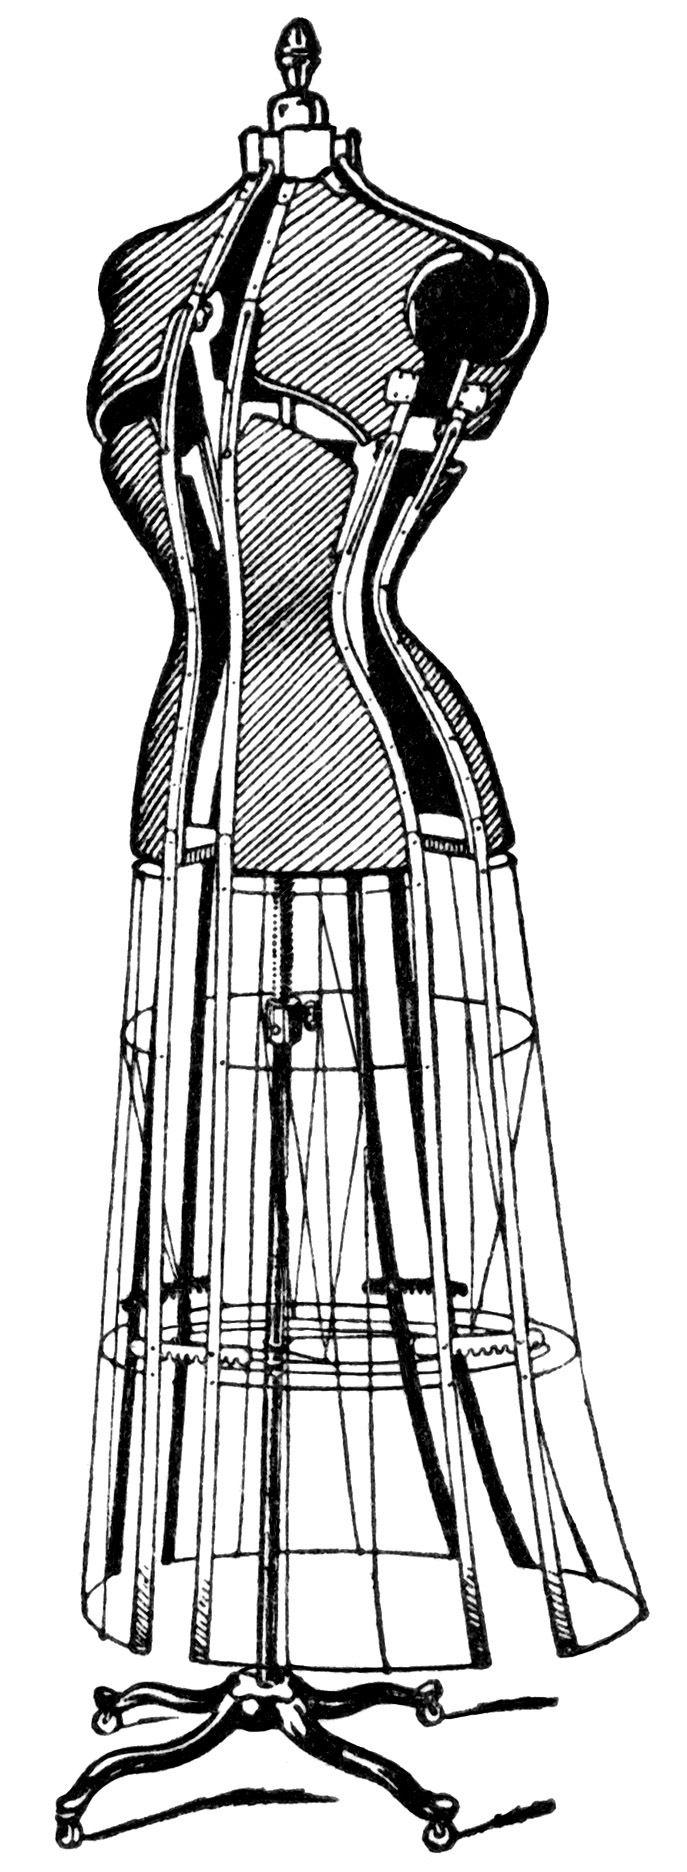 687x1872 Dress Clipart Vintage Dress